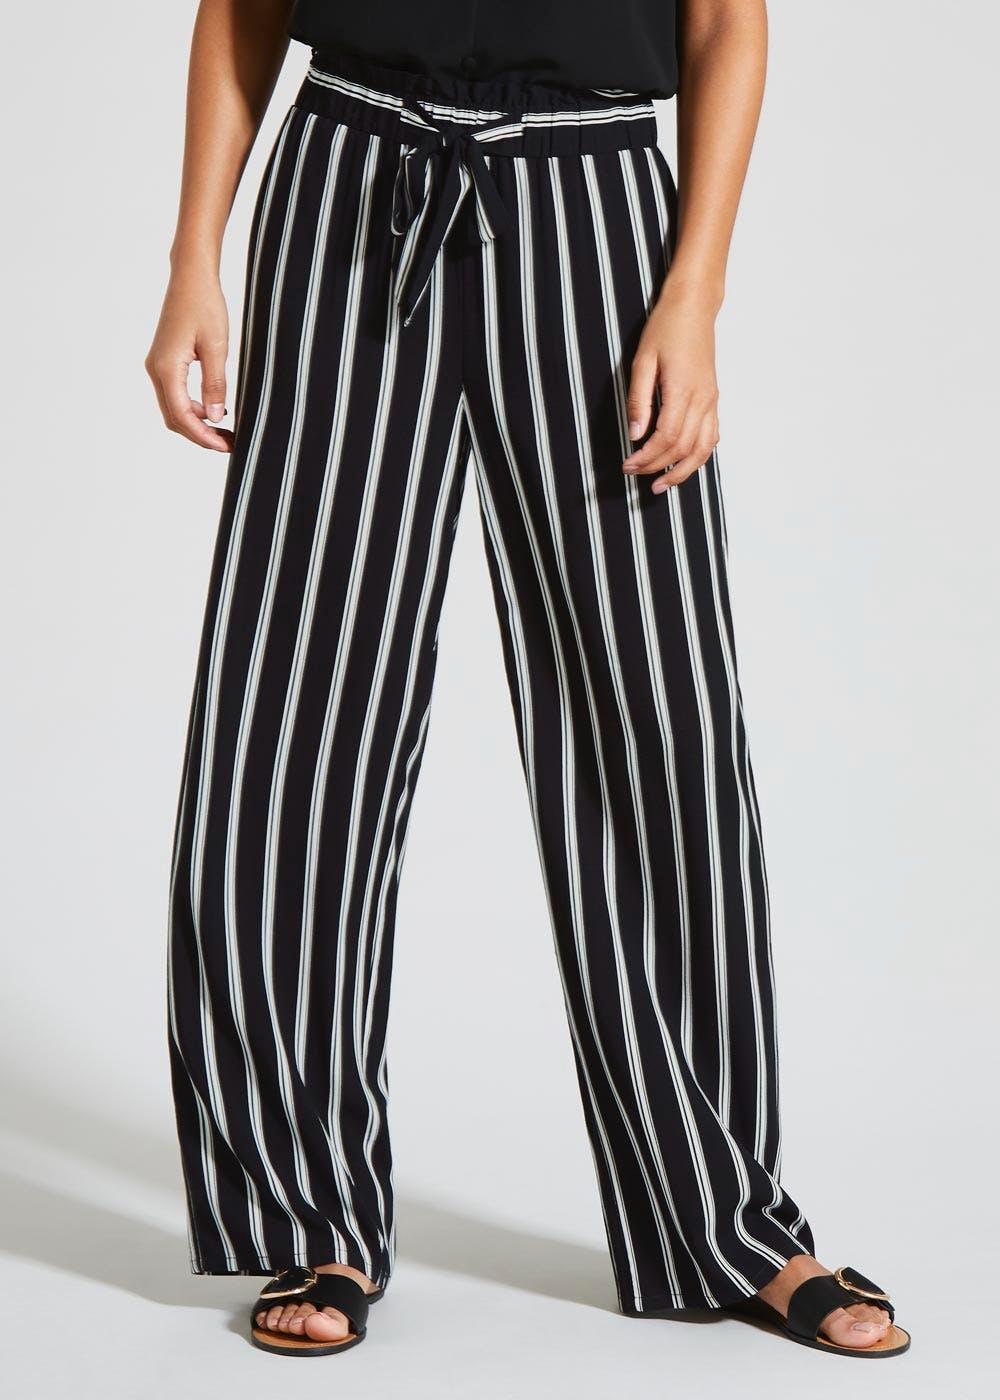 Stripe Wide Leg Trousers – Black